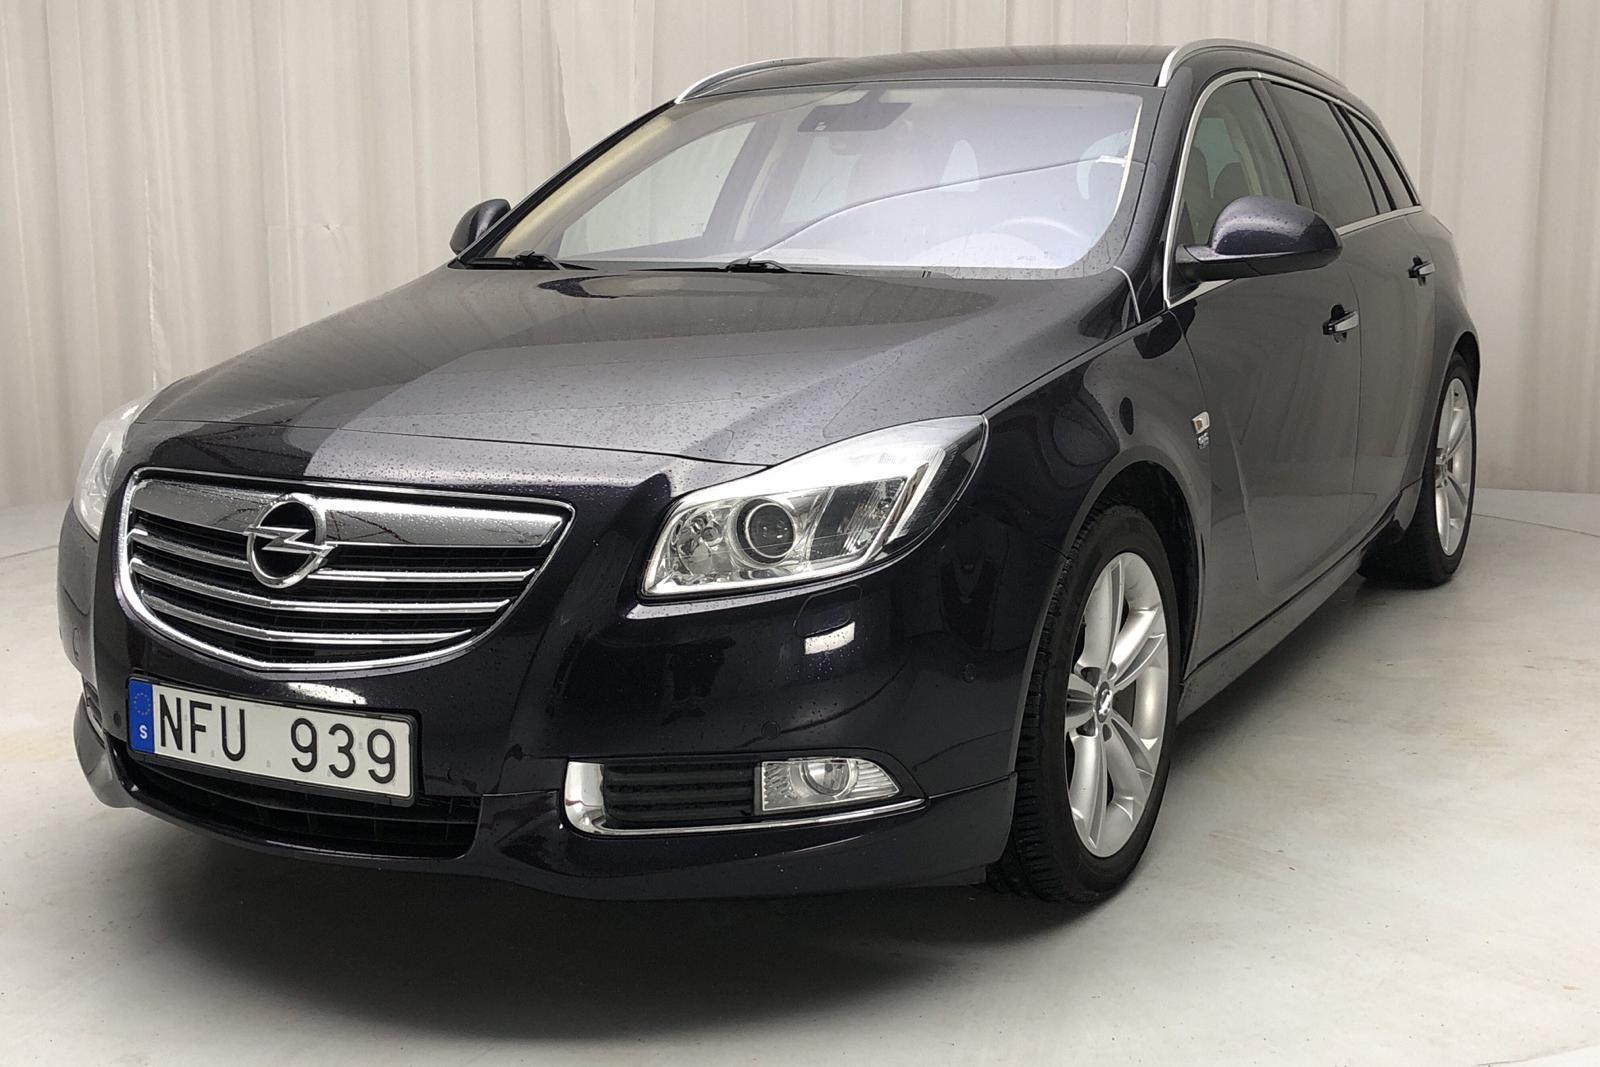 Opel Insignia 2.0 CDTI ecoFLEX Sport Tourer (160hk)